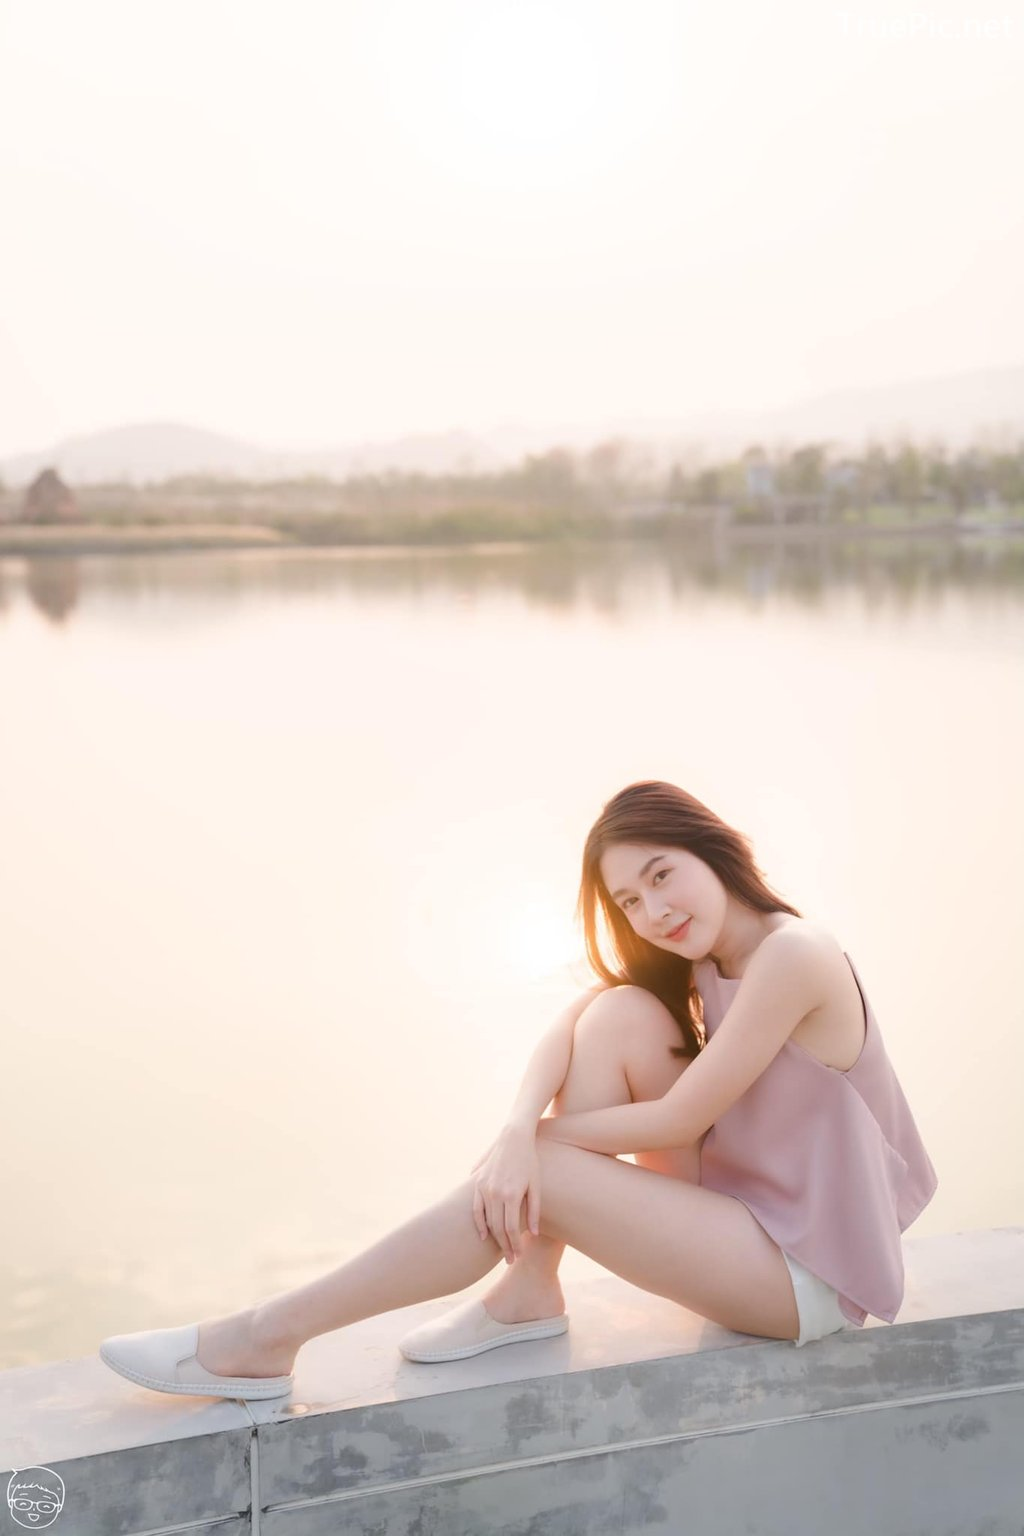 Image Thailand Model - Namlom Homhuan - Sweet Pink - TruePic.net - Picture-7